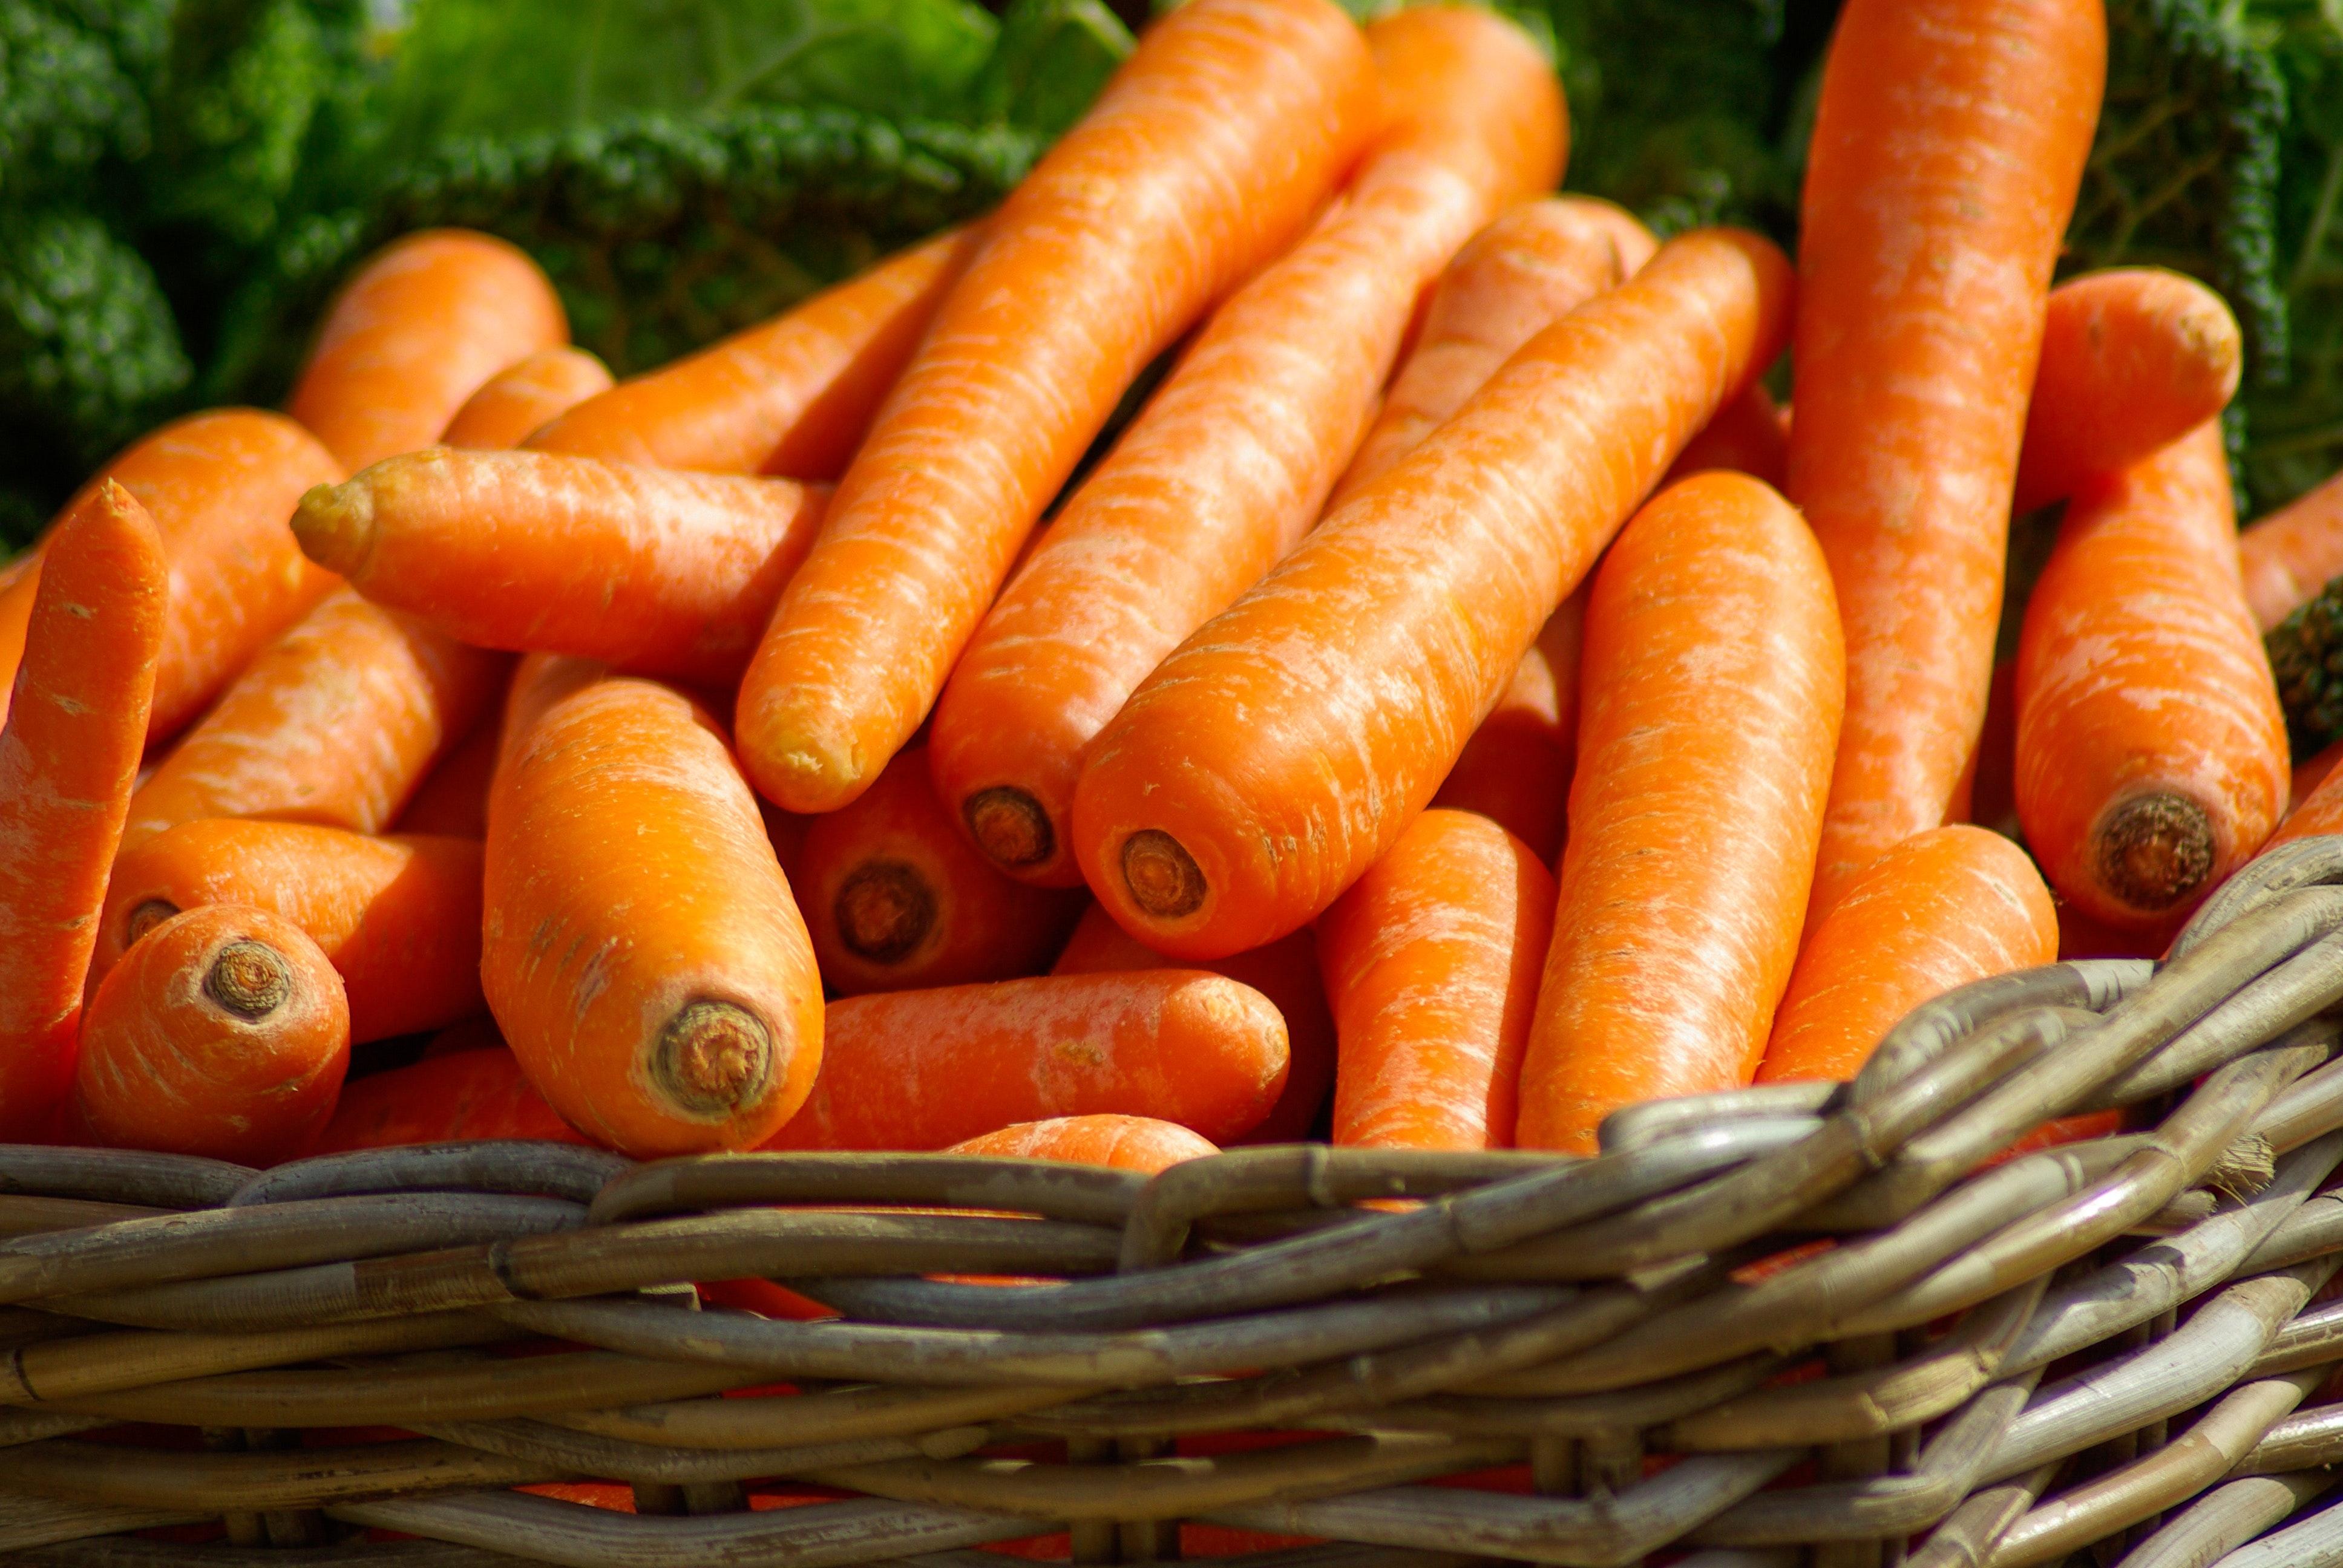 basket-carrots-close-up-37641